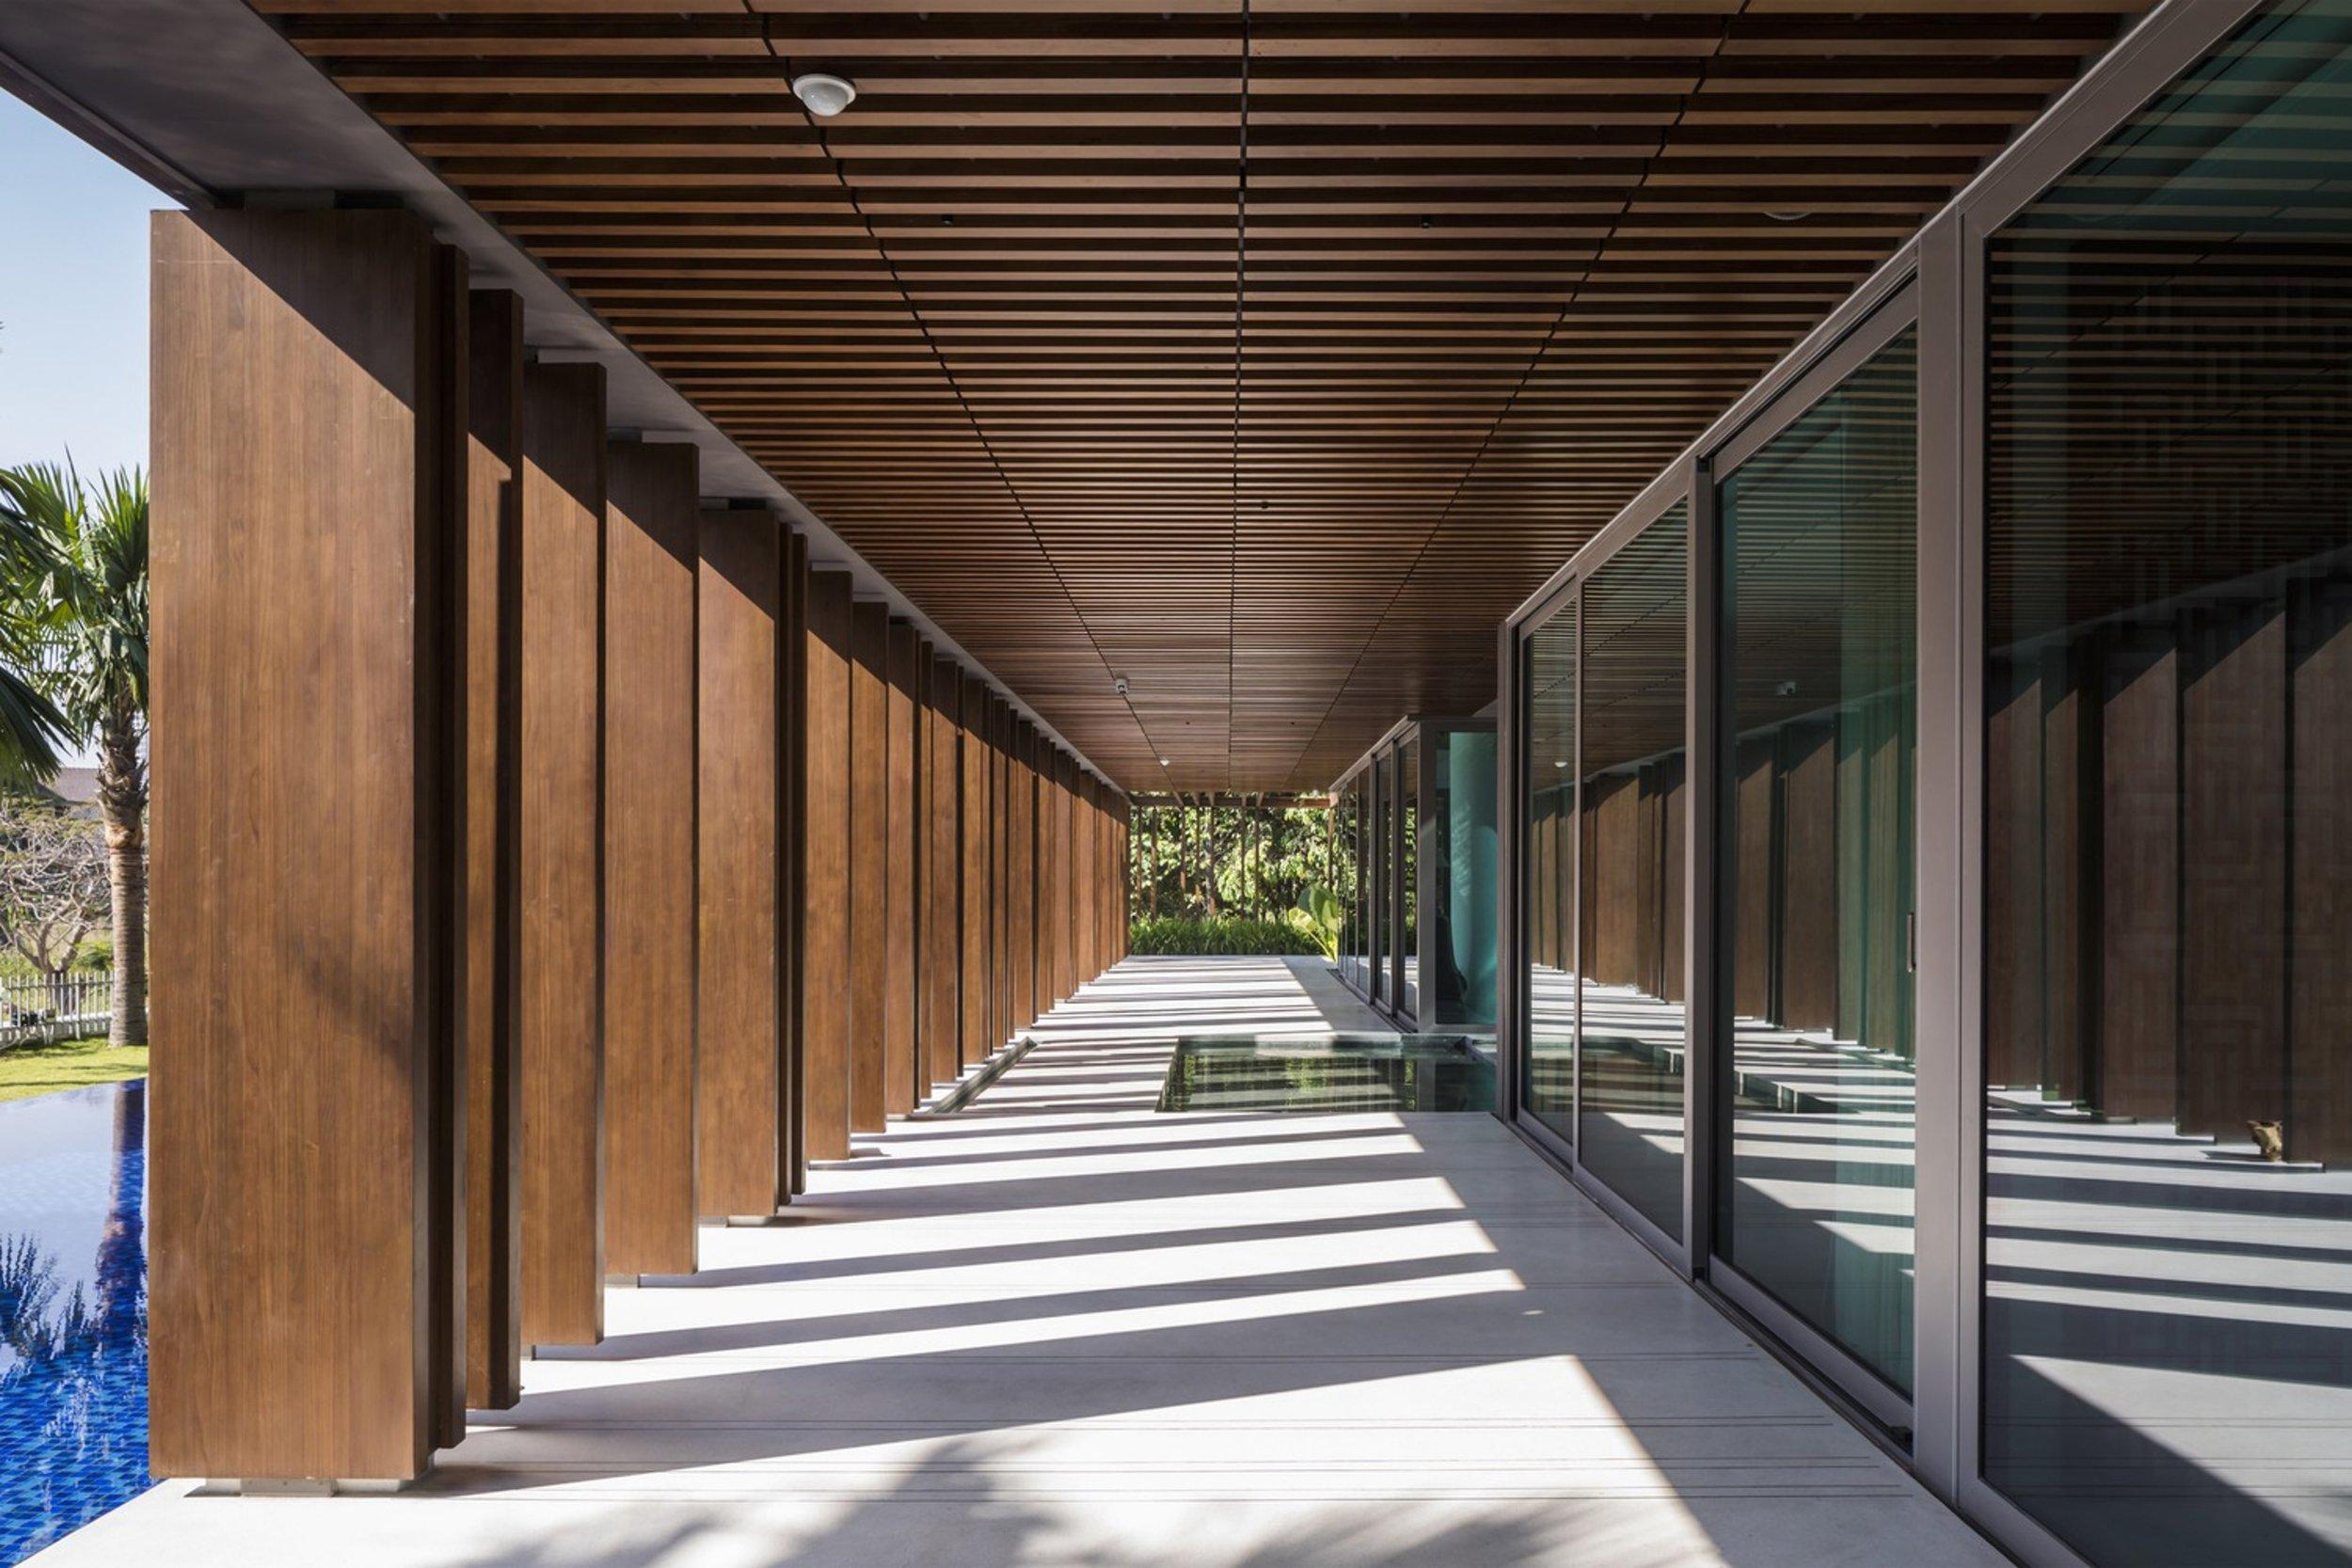 louvers-house-mia-design-studio-5.jpg